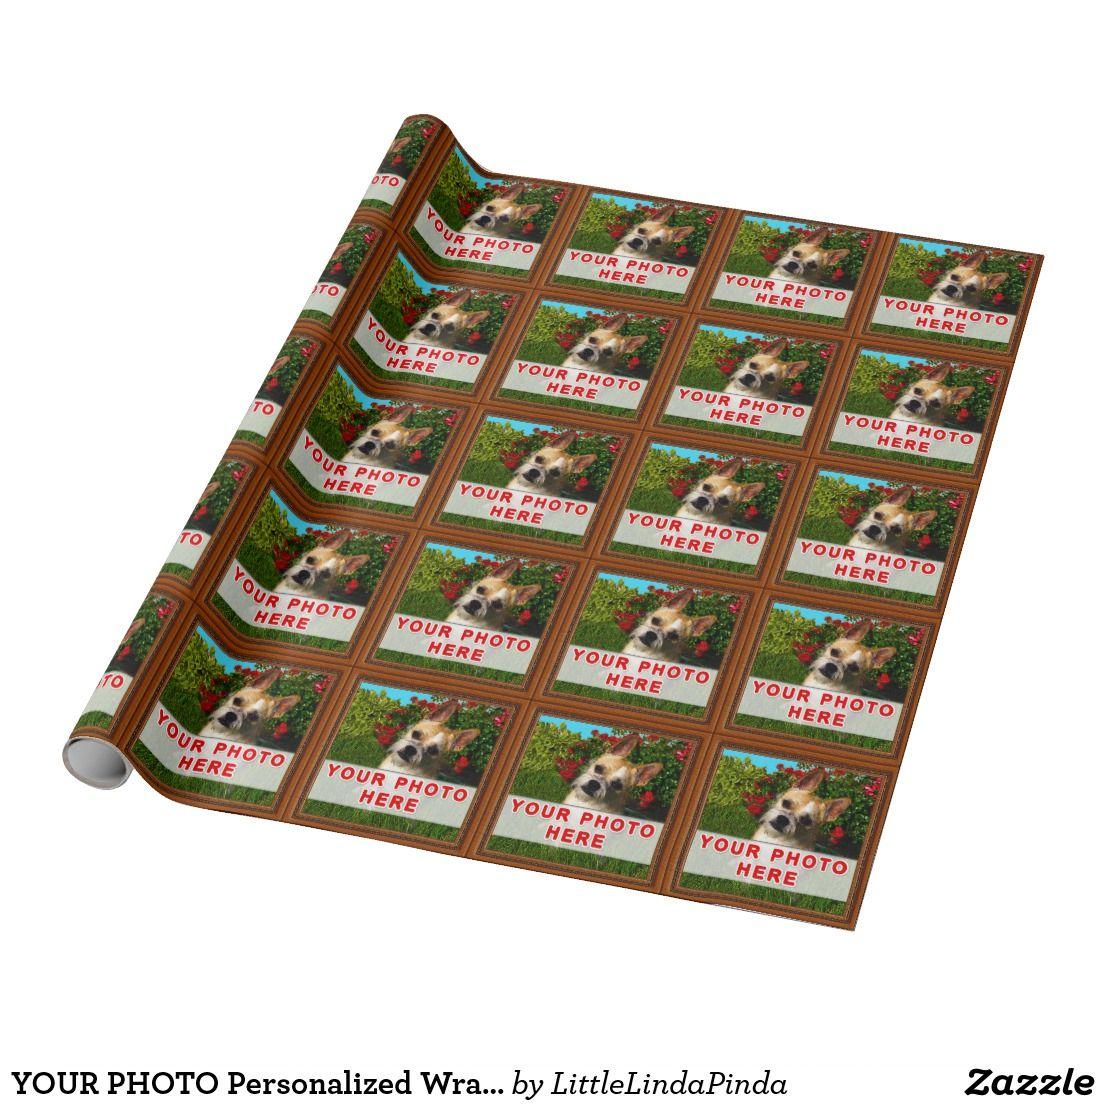 YOUR PHOTO Personalized Wrapping Paper | Zazzle.com #grandparentphoto